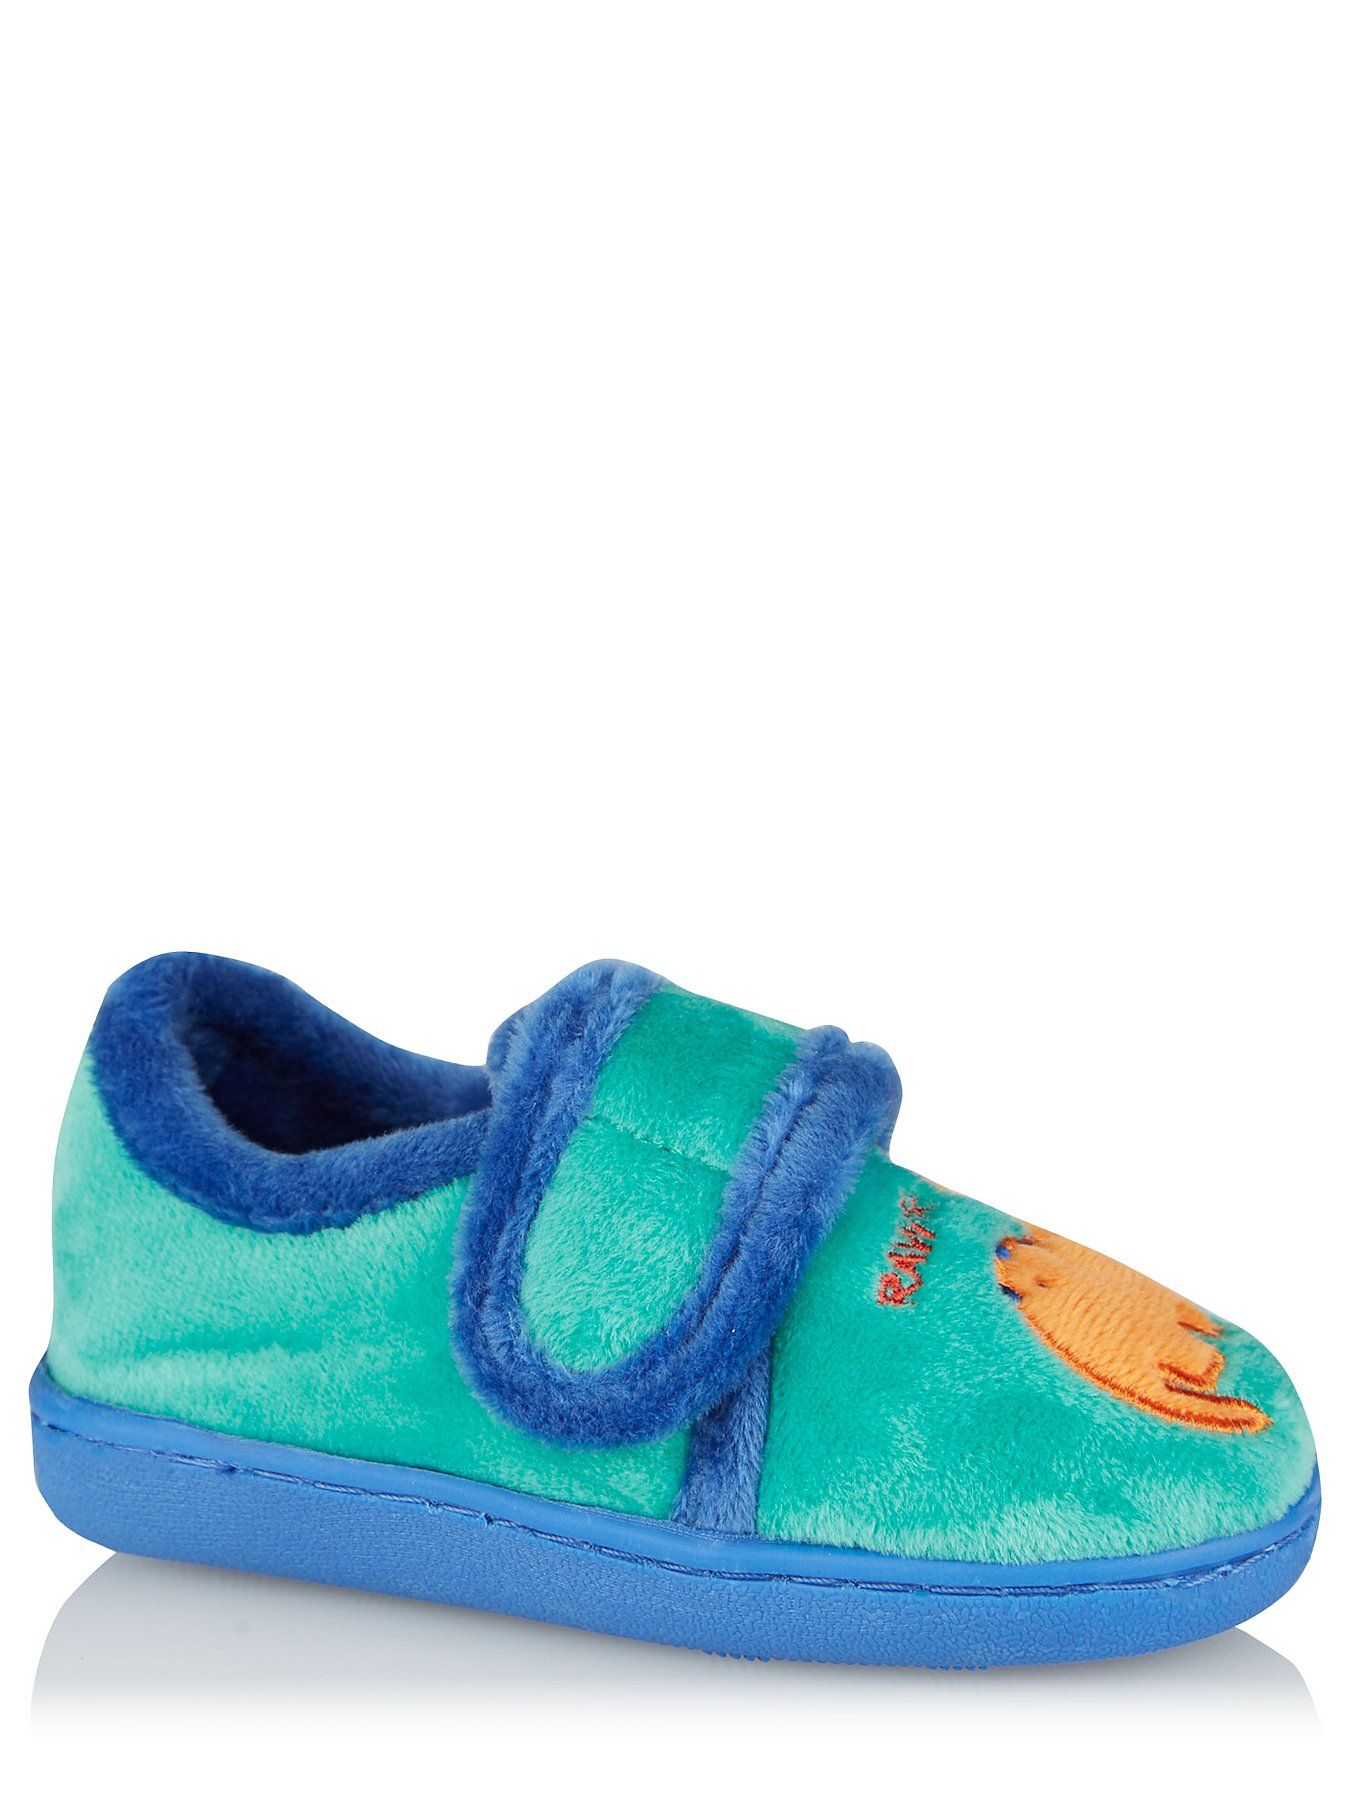 George | Boy shoes, Boys shoes, Kid shoes